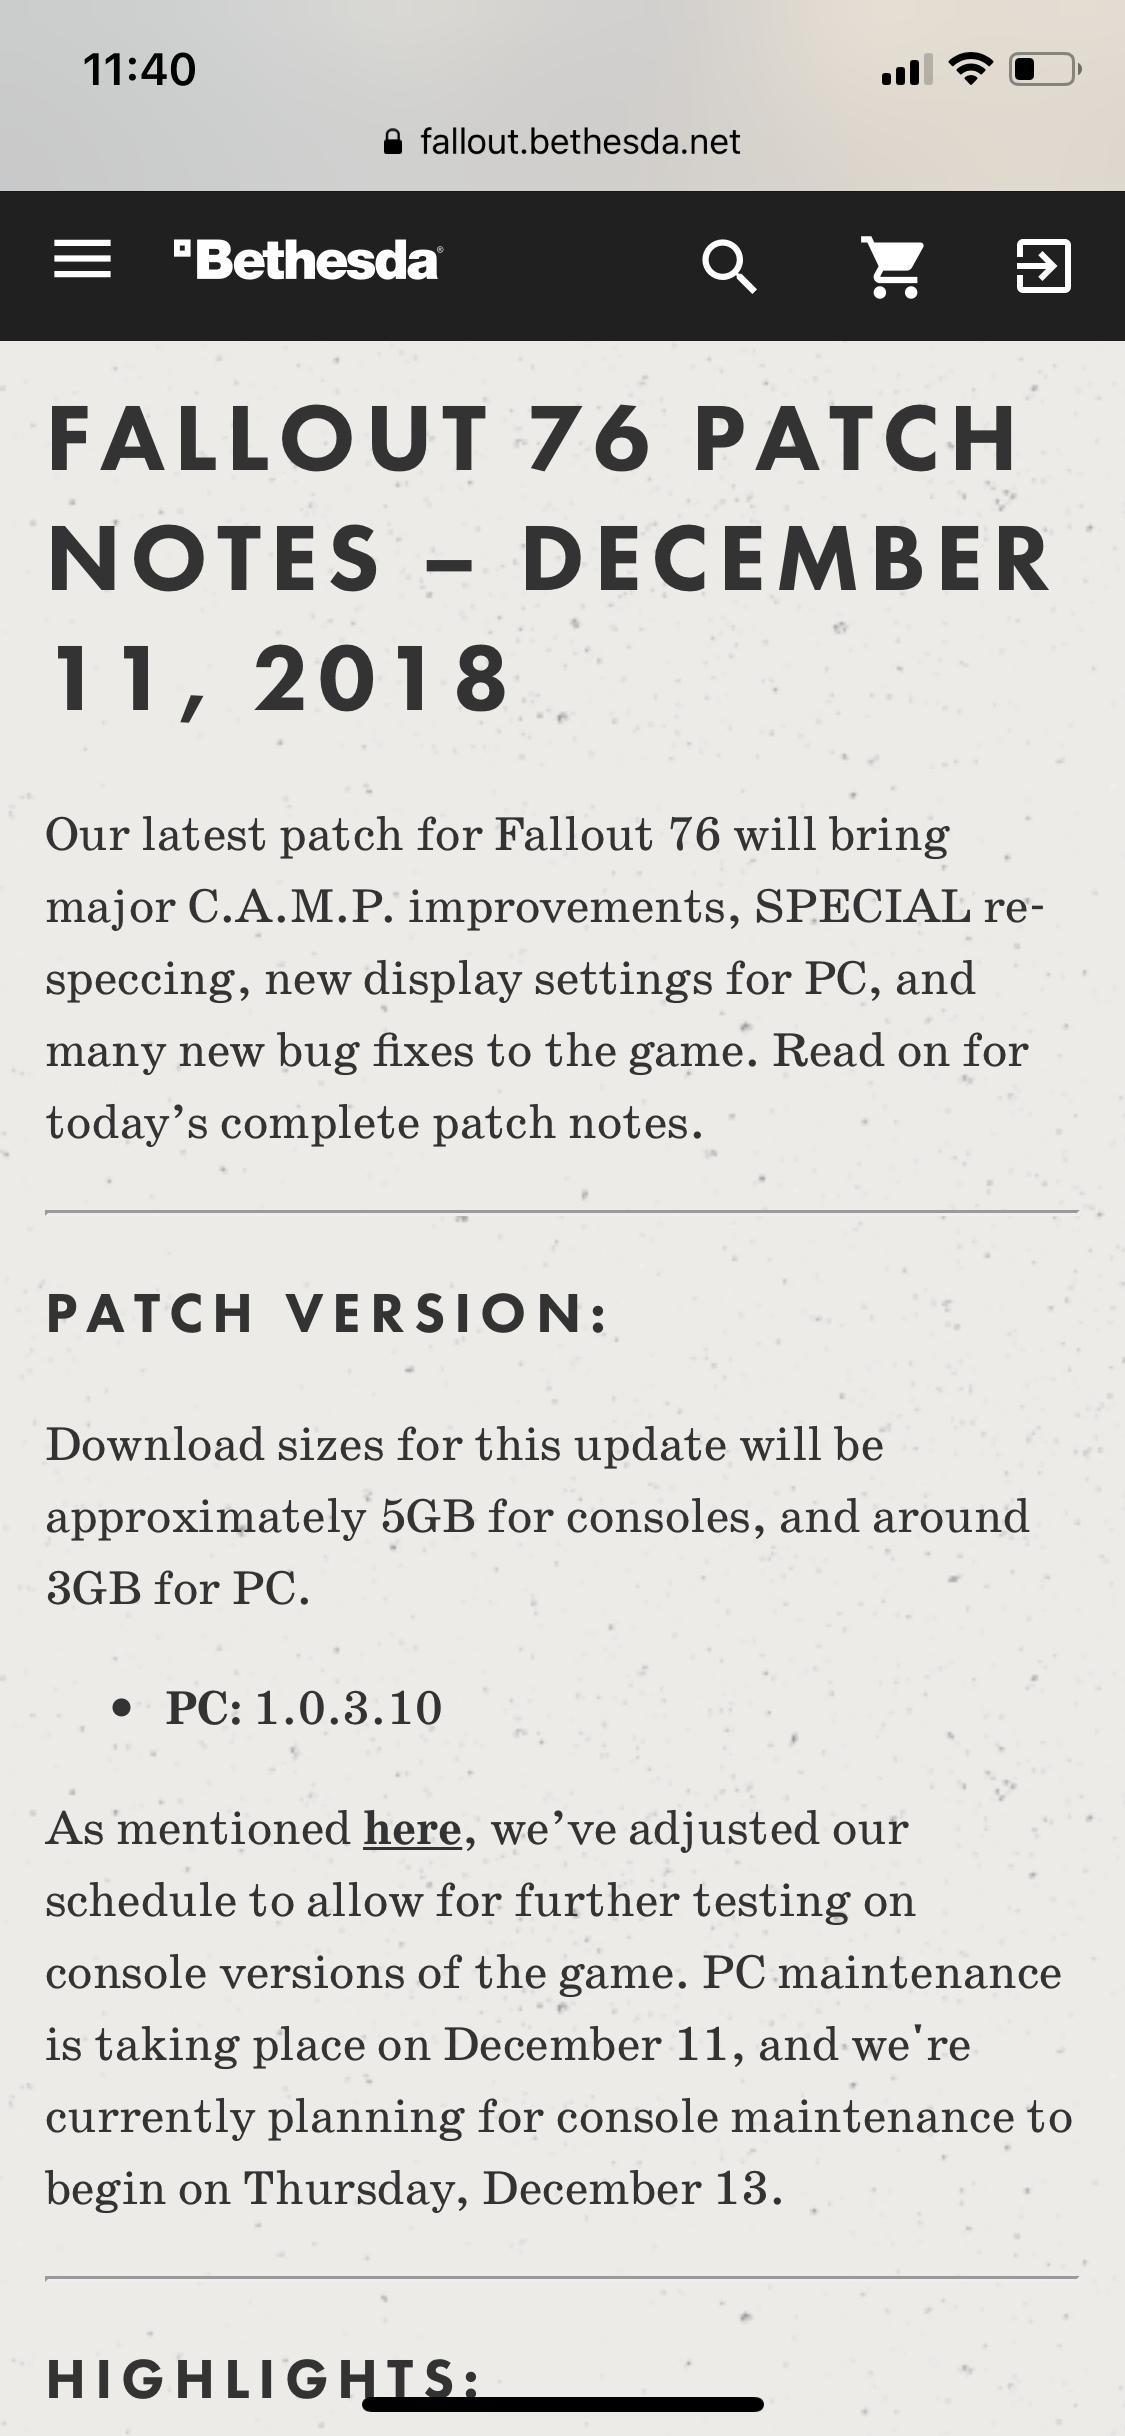 Bethesda: Fallout 76 Coming | Page 8 | MacRumors Forums